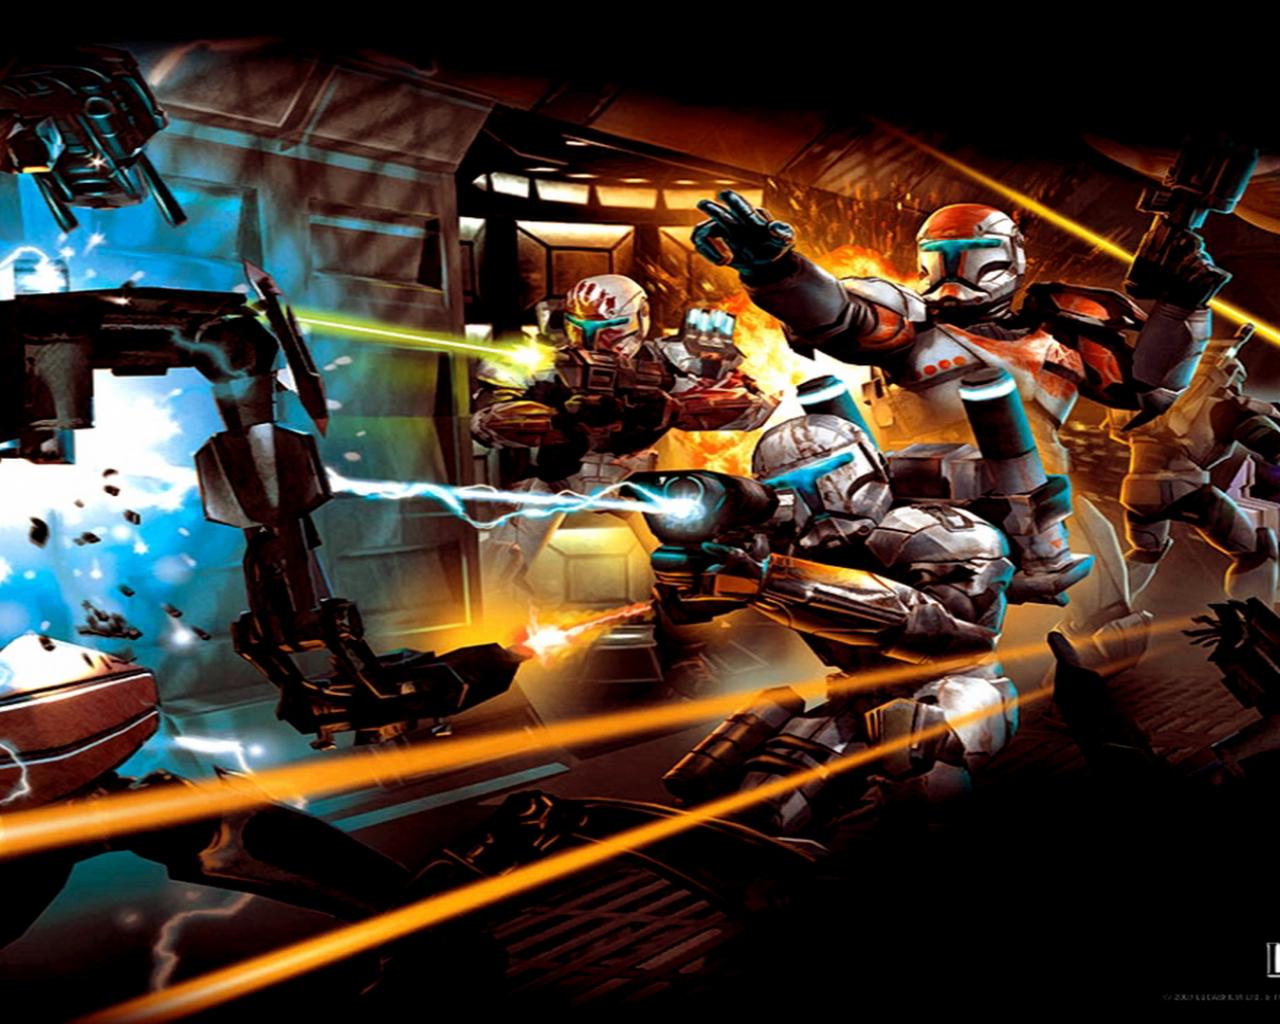 Free Download Republic Commando Wallpapers 16980 Hd Desktop